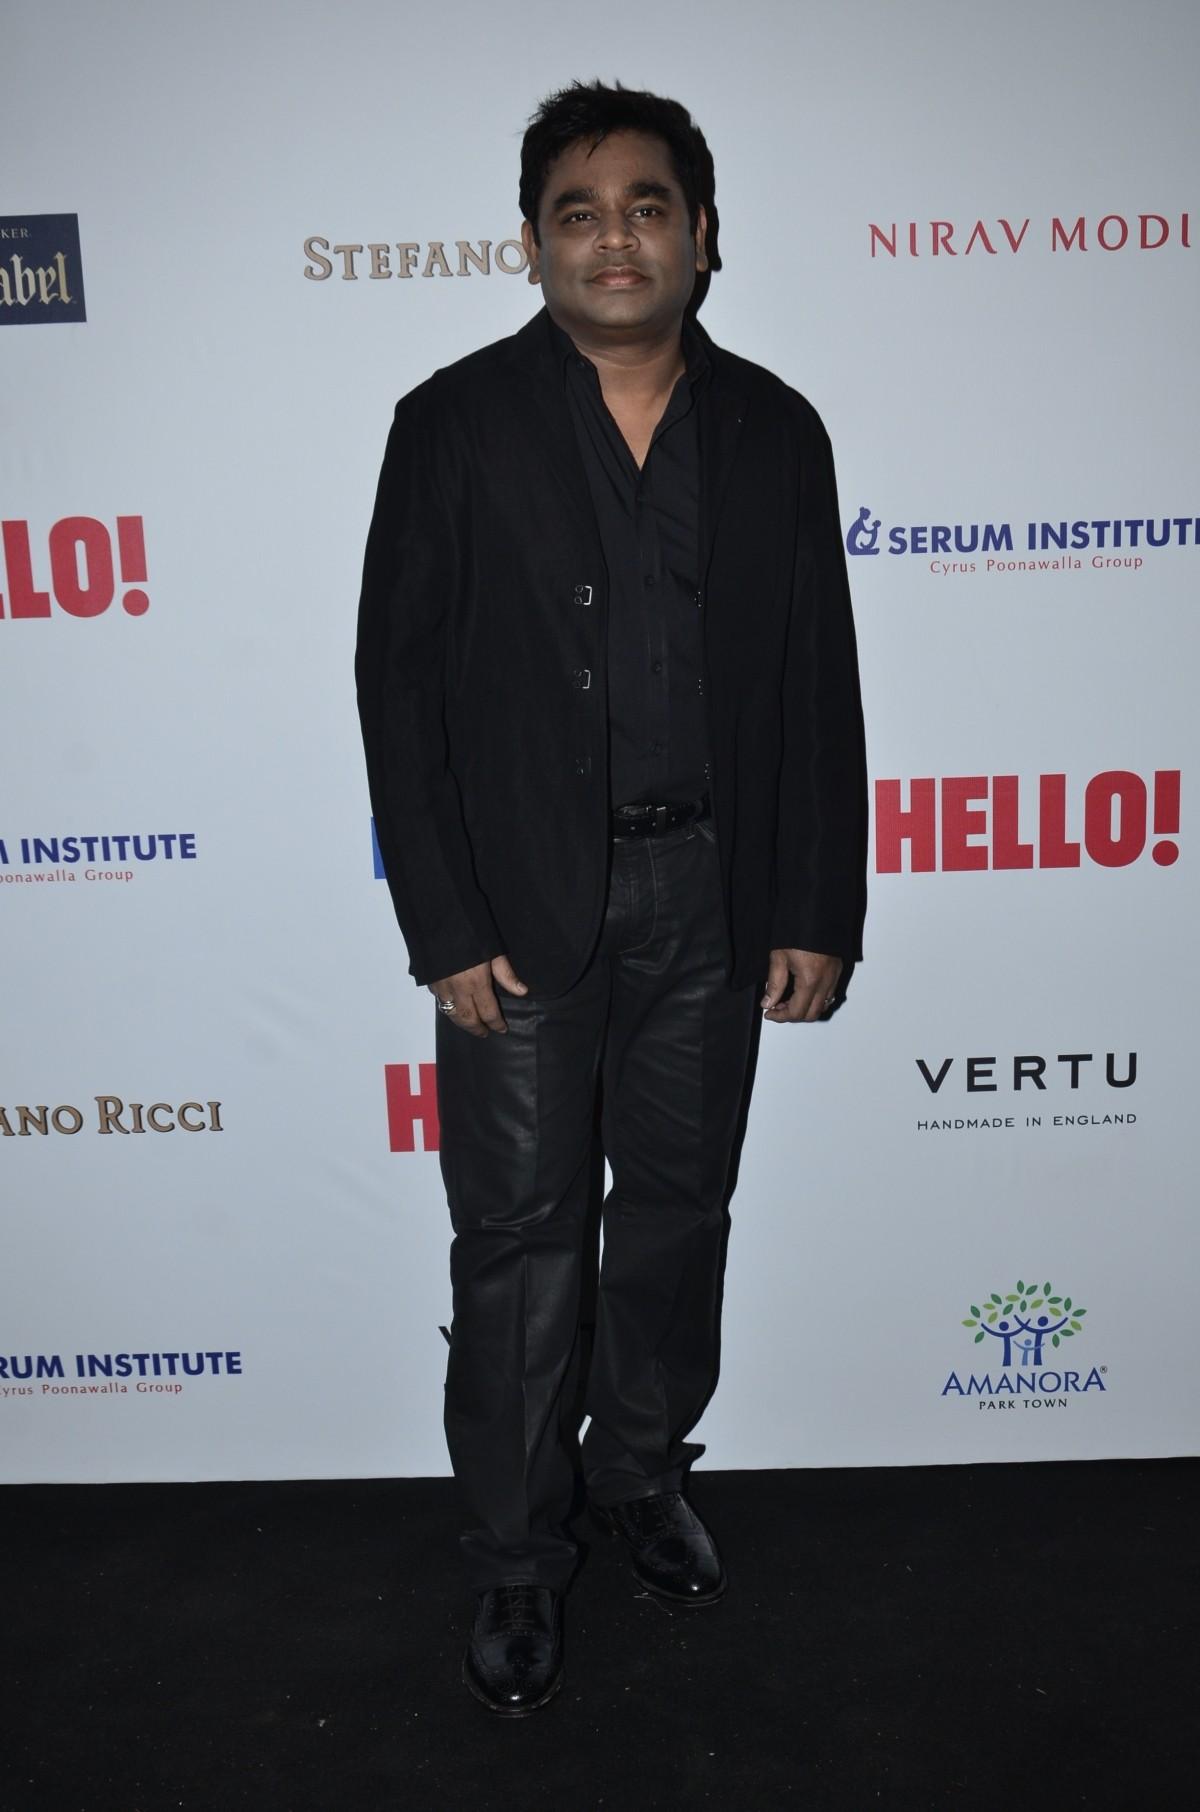 Hello! Hall of Fame Awards 2014